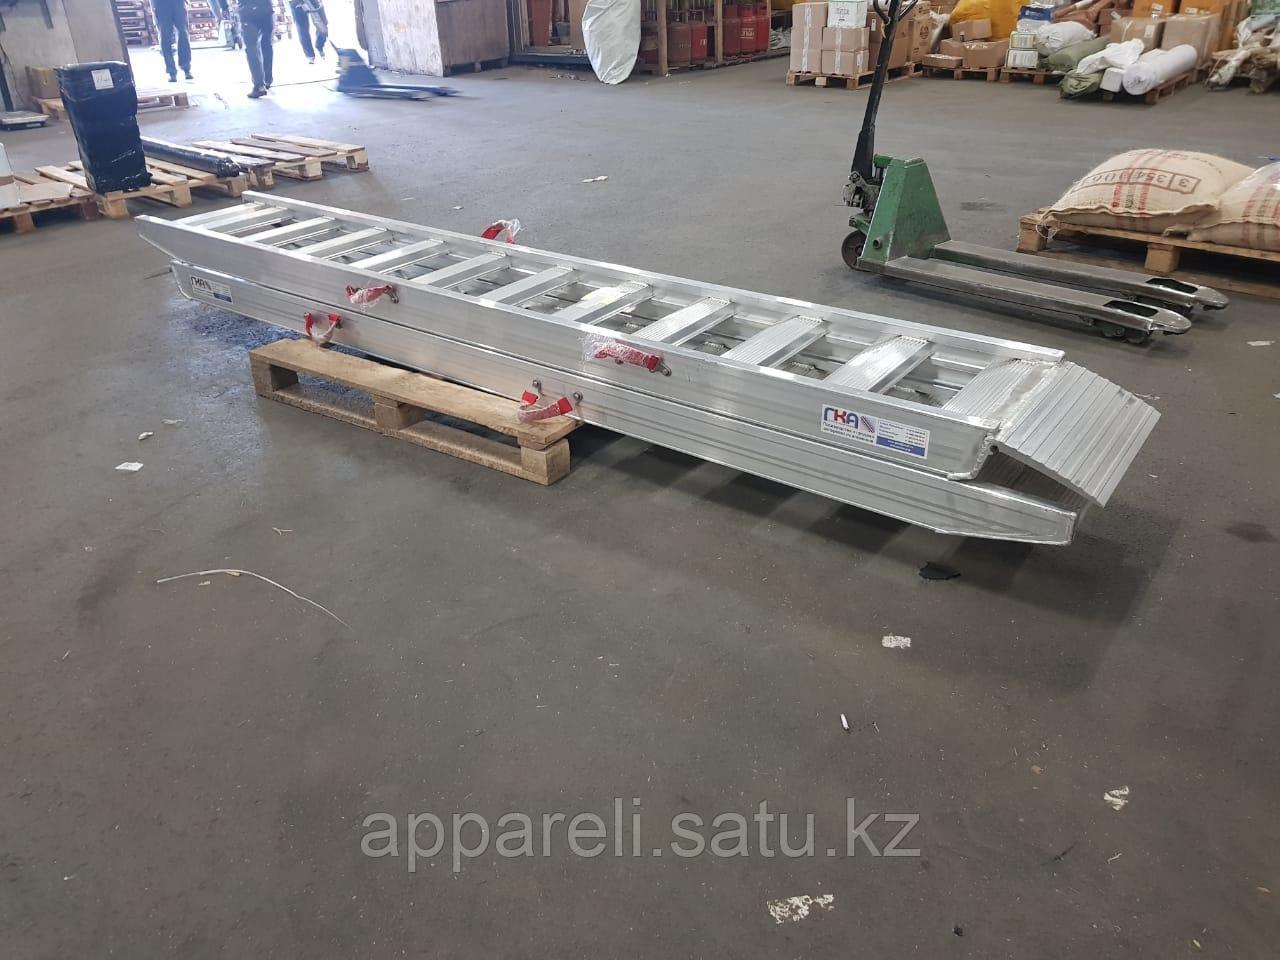 Алюминиевые аппарели от производителя 3 метра, 7 тонн